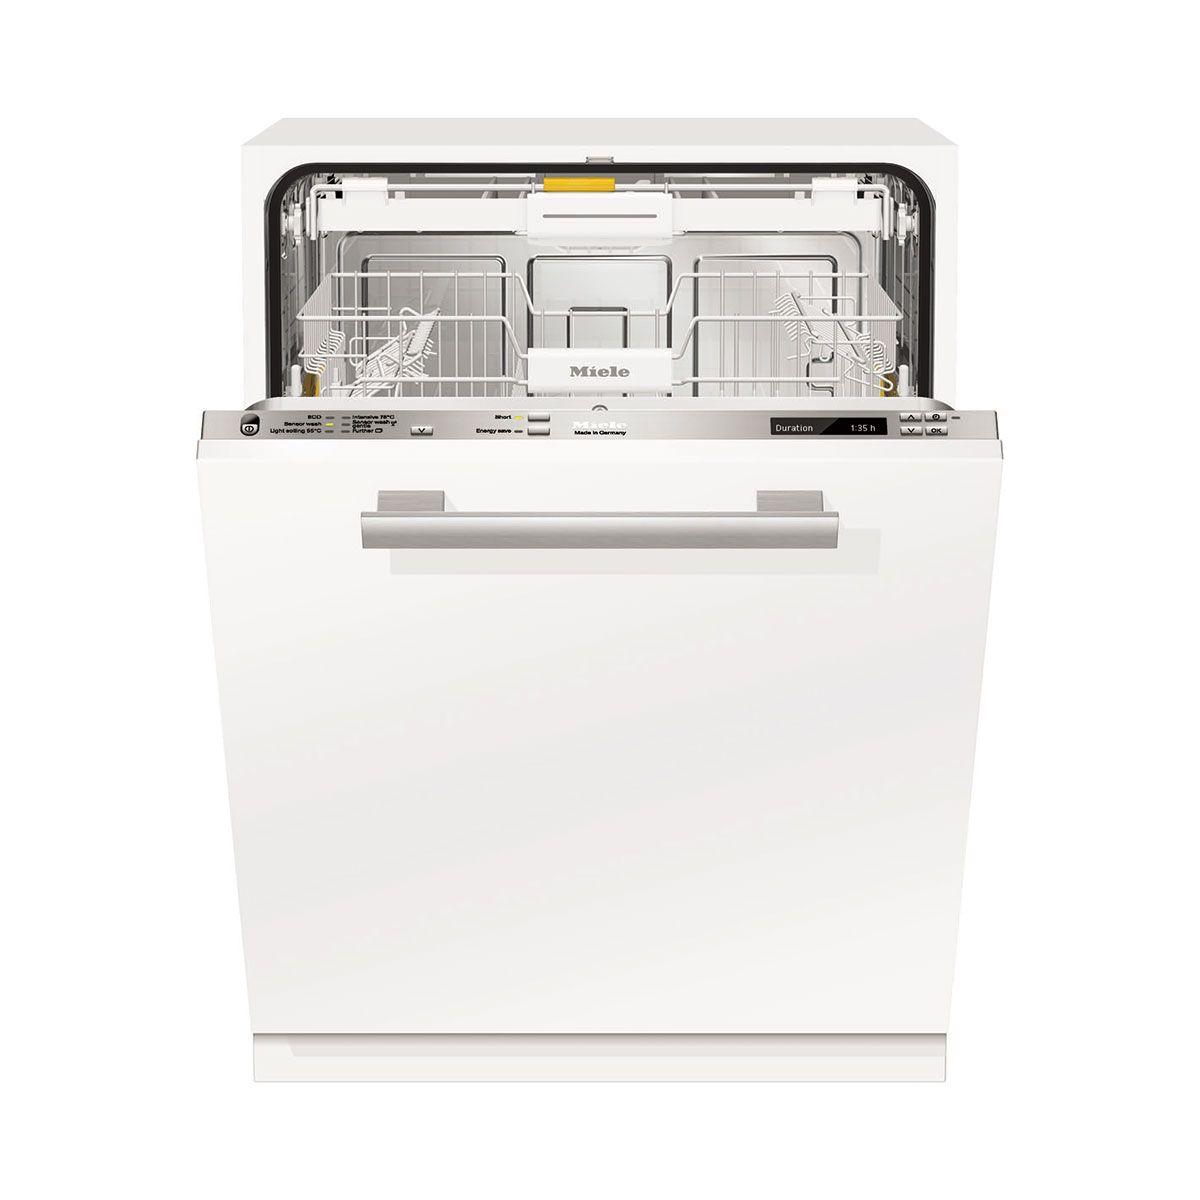 85 Cm Tall 9 Wash Programmes Cursor Pushbutton Controls Turbo